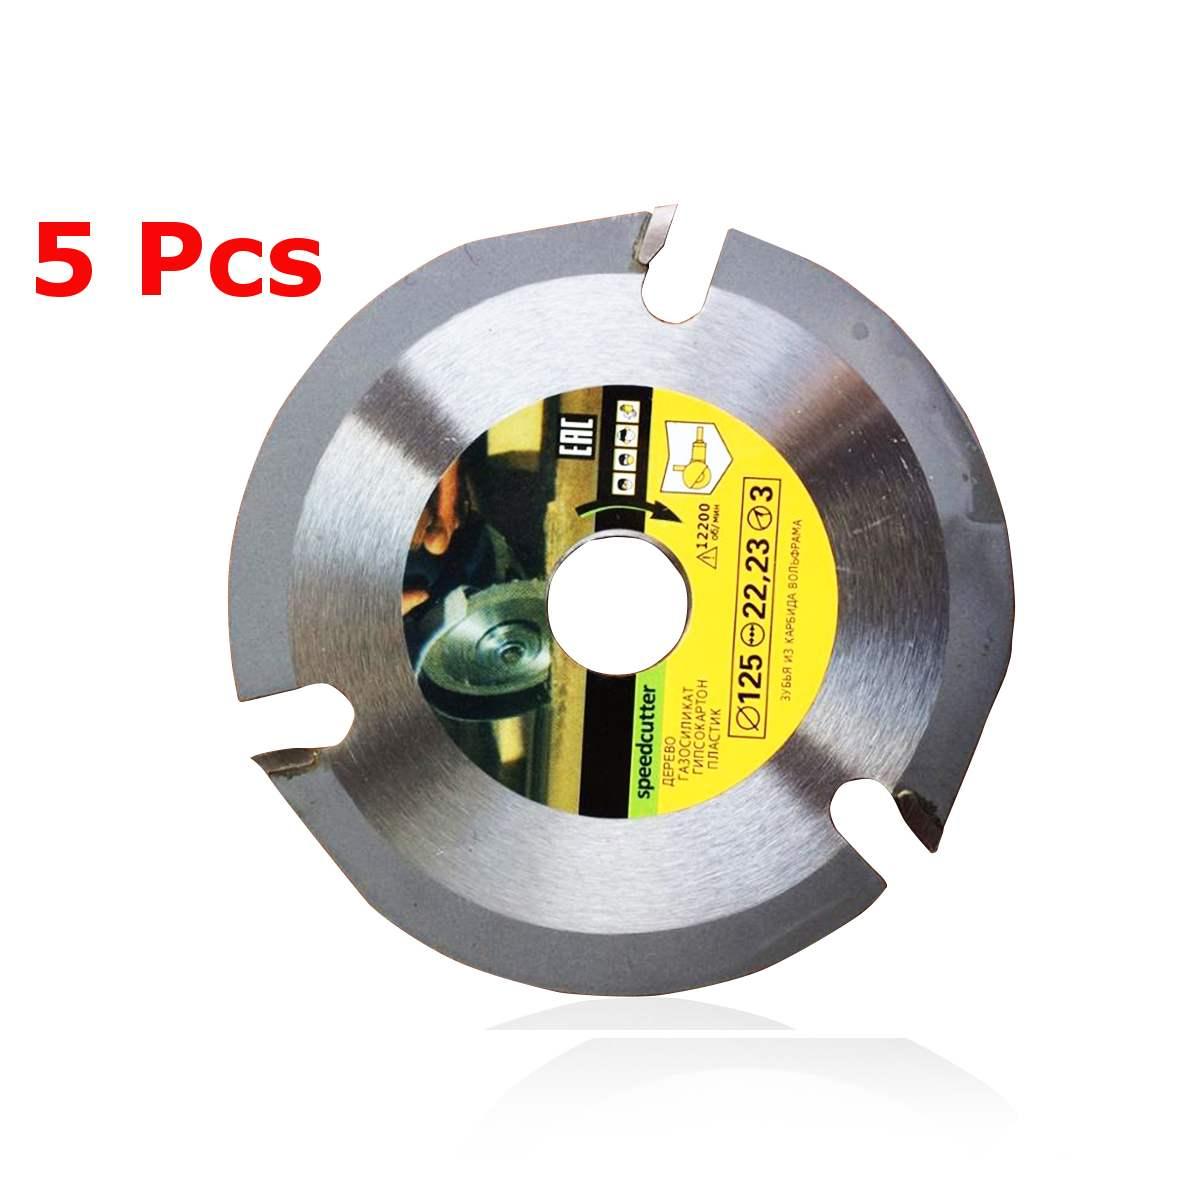 5Pcs 125mm 3 T Circular Saw Blade Multitool Grinder Saw Disc Carbide Tipped Wood Cutting Disc Carving Disc Tool Multitool Blades